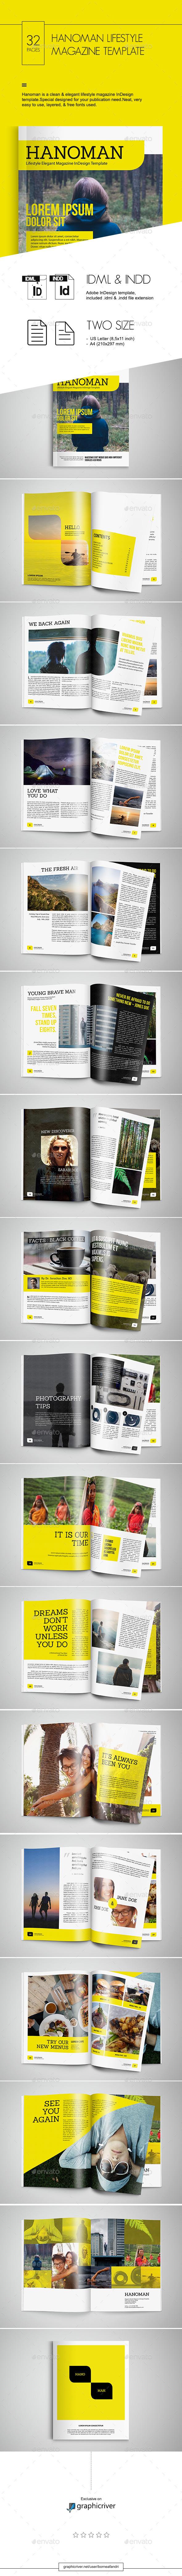 Hanoman Lifestyle Magazine Template